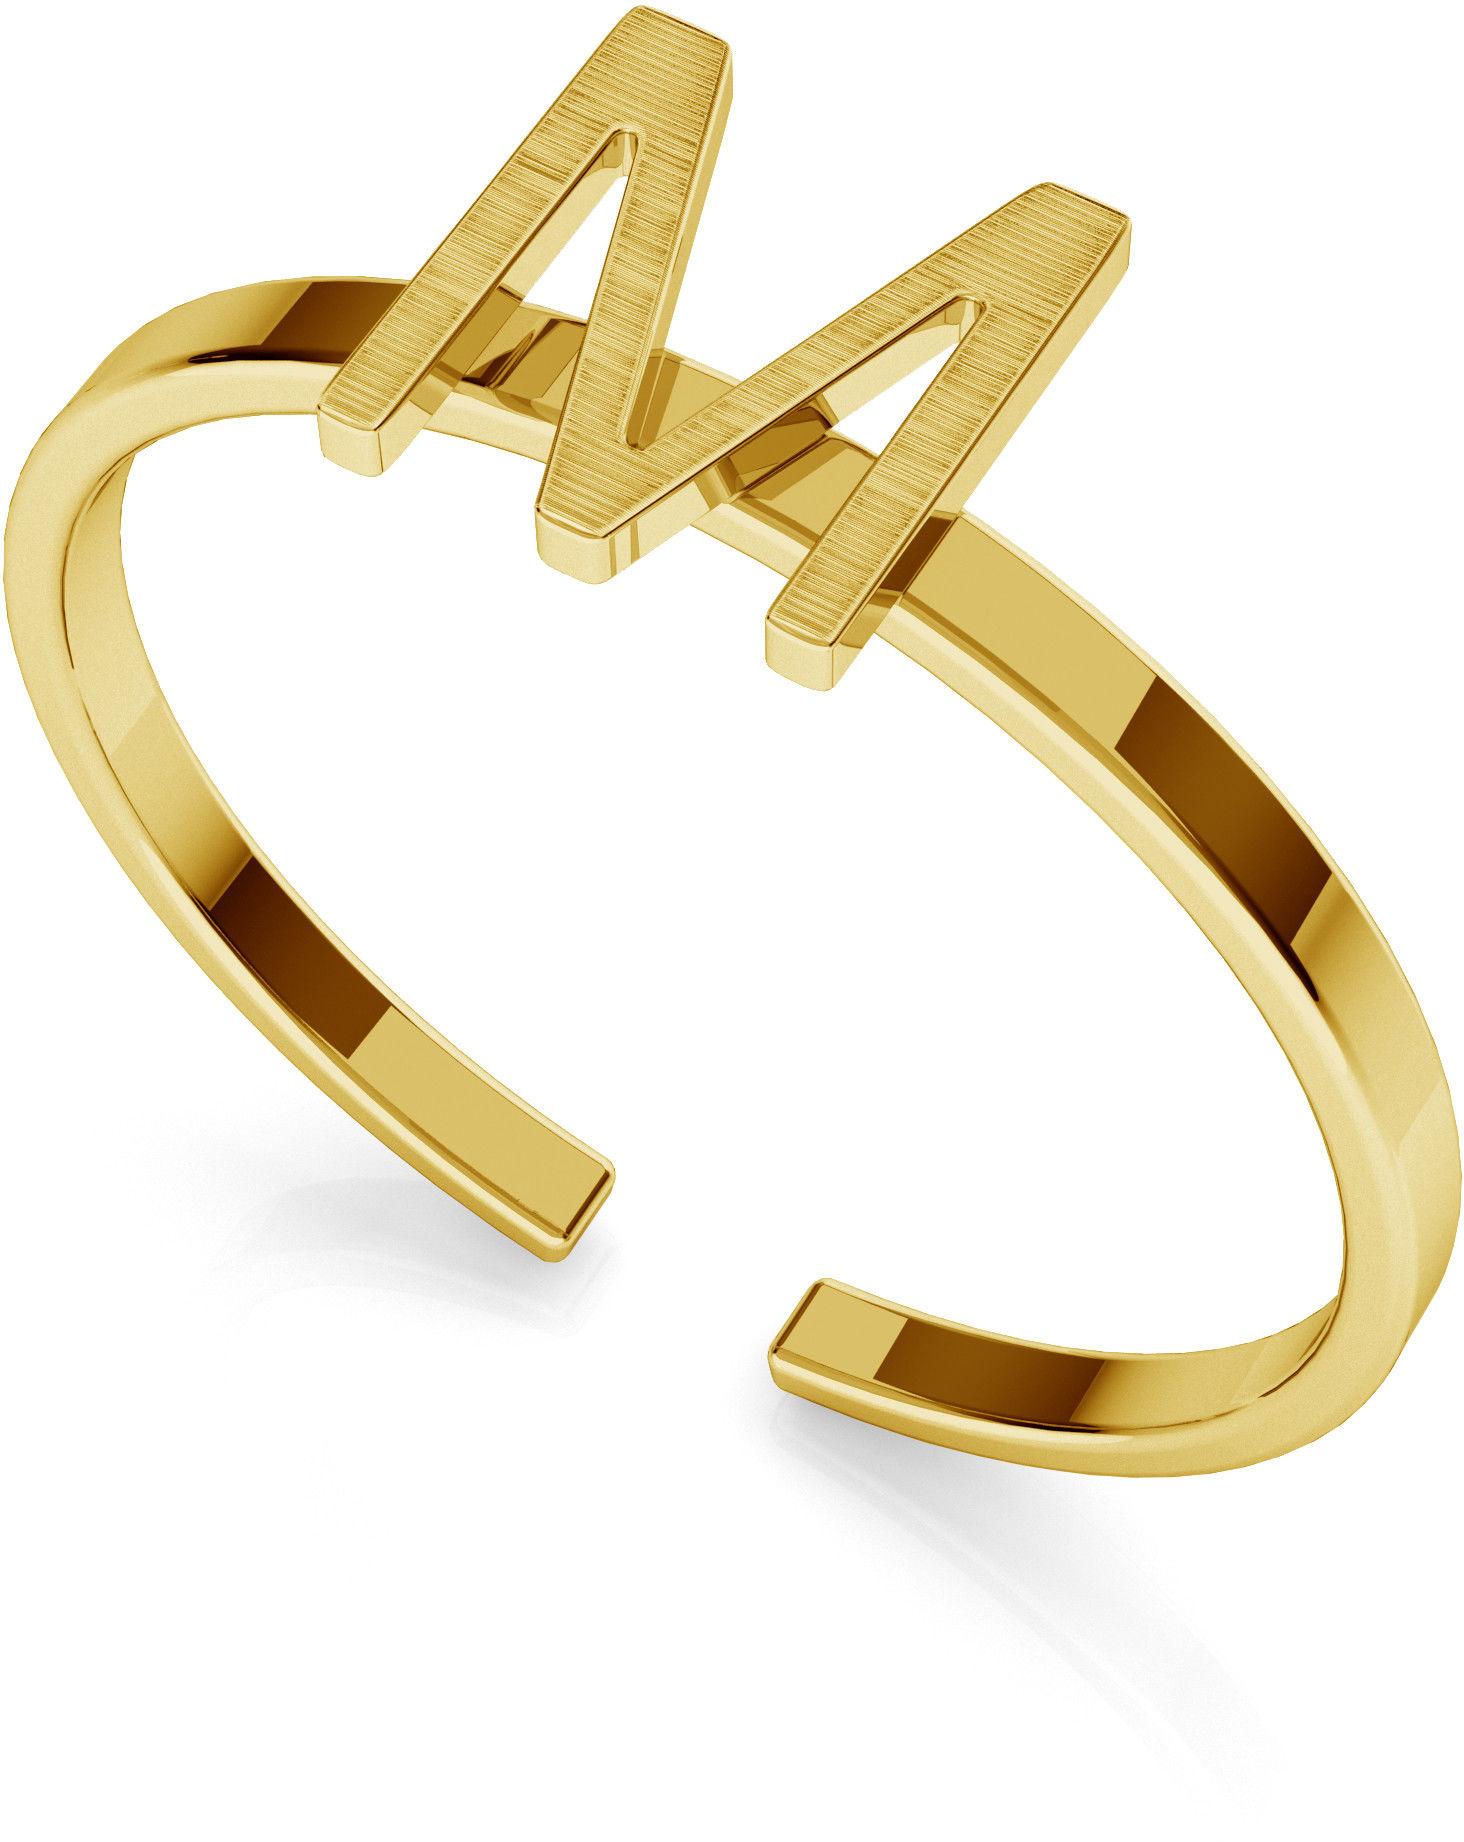 Srebrny pierścionek z literką My RING, srebro 925 : Litera - L, Srebro - kolor pokrycia - Pokrycie platyną